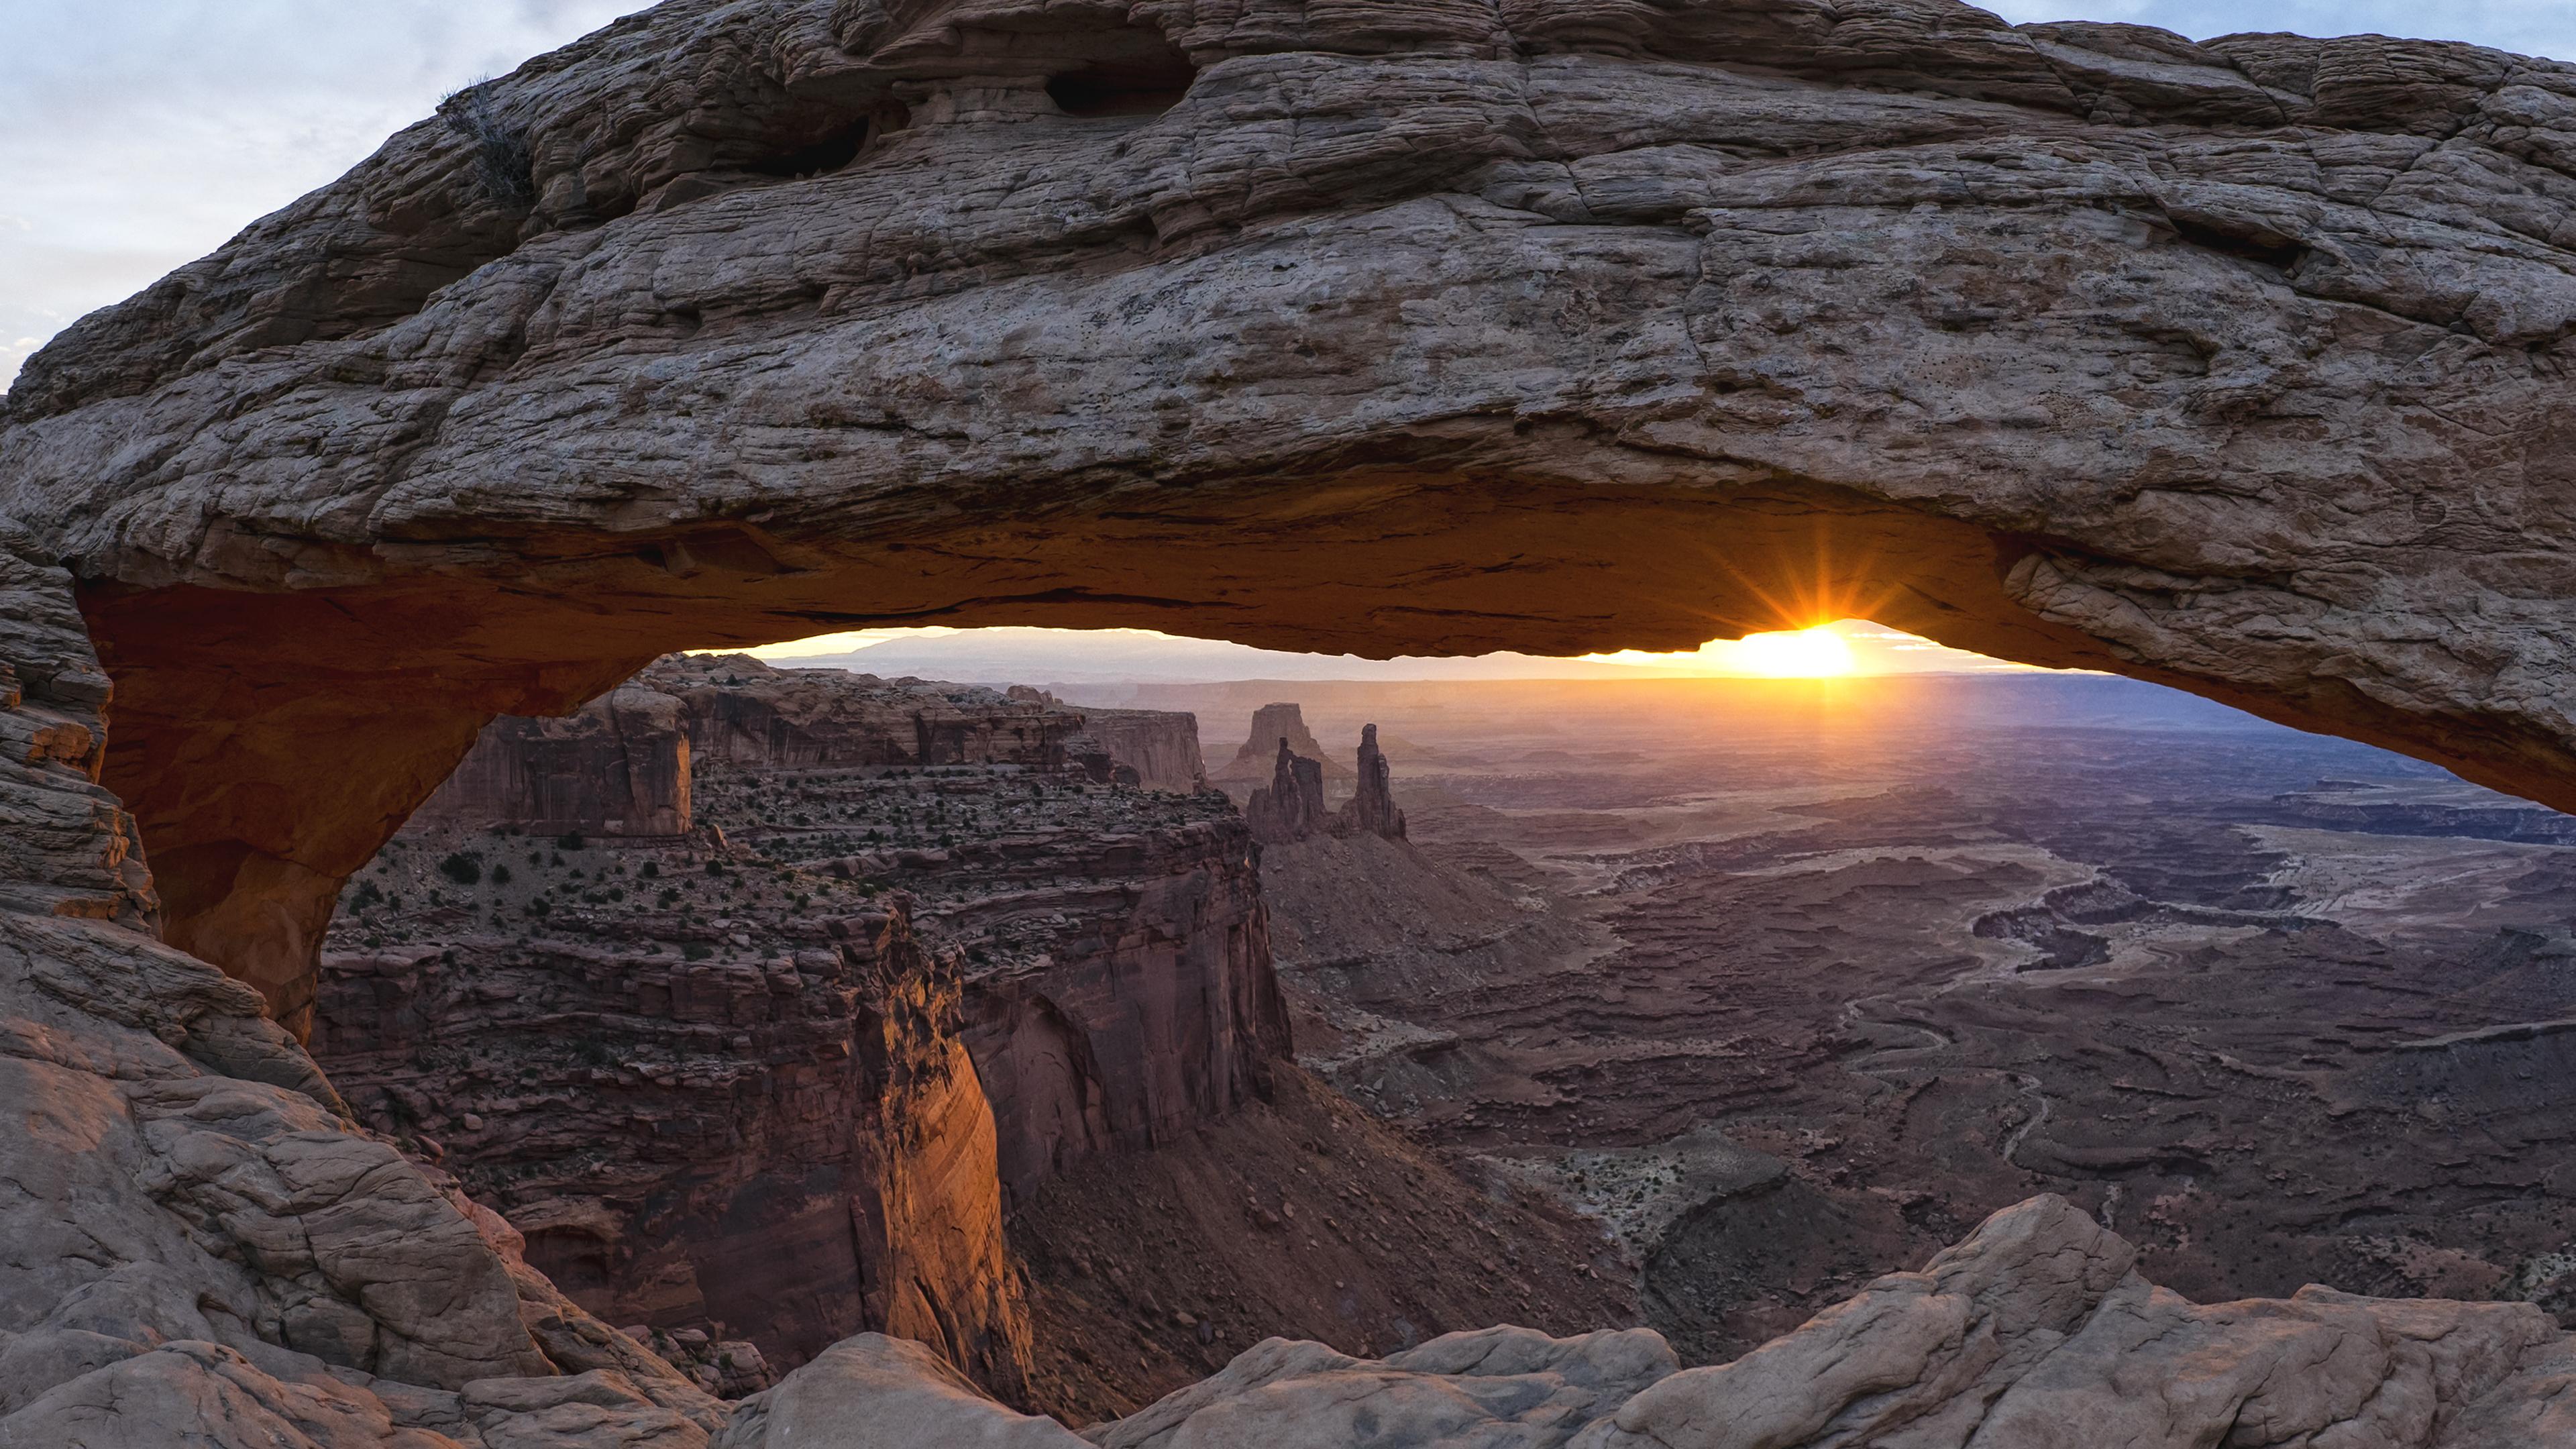 Mesa arch sunrise 4k wallpaper background hd wallpaper background - 4k wallpaper download ...